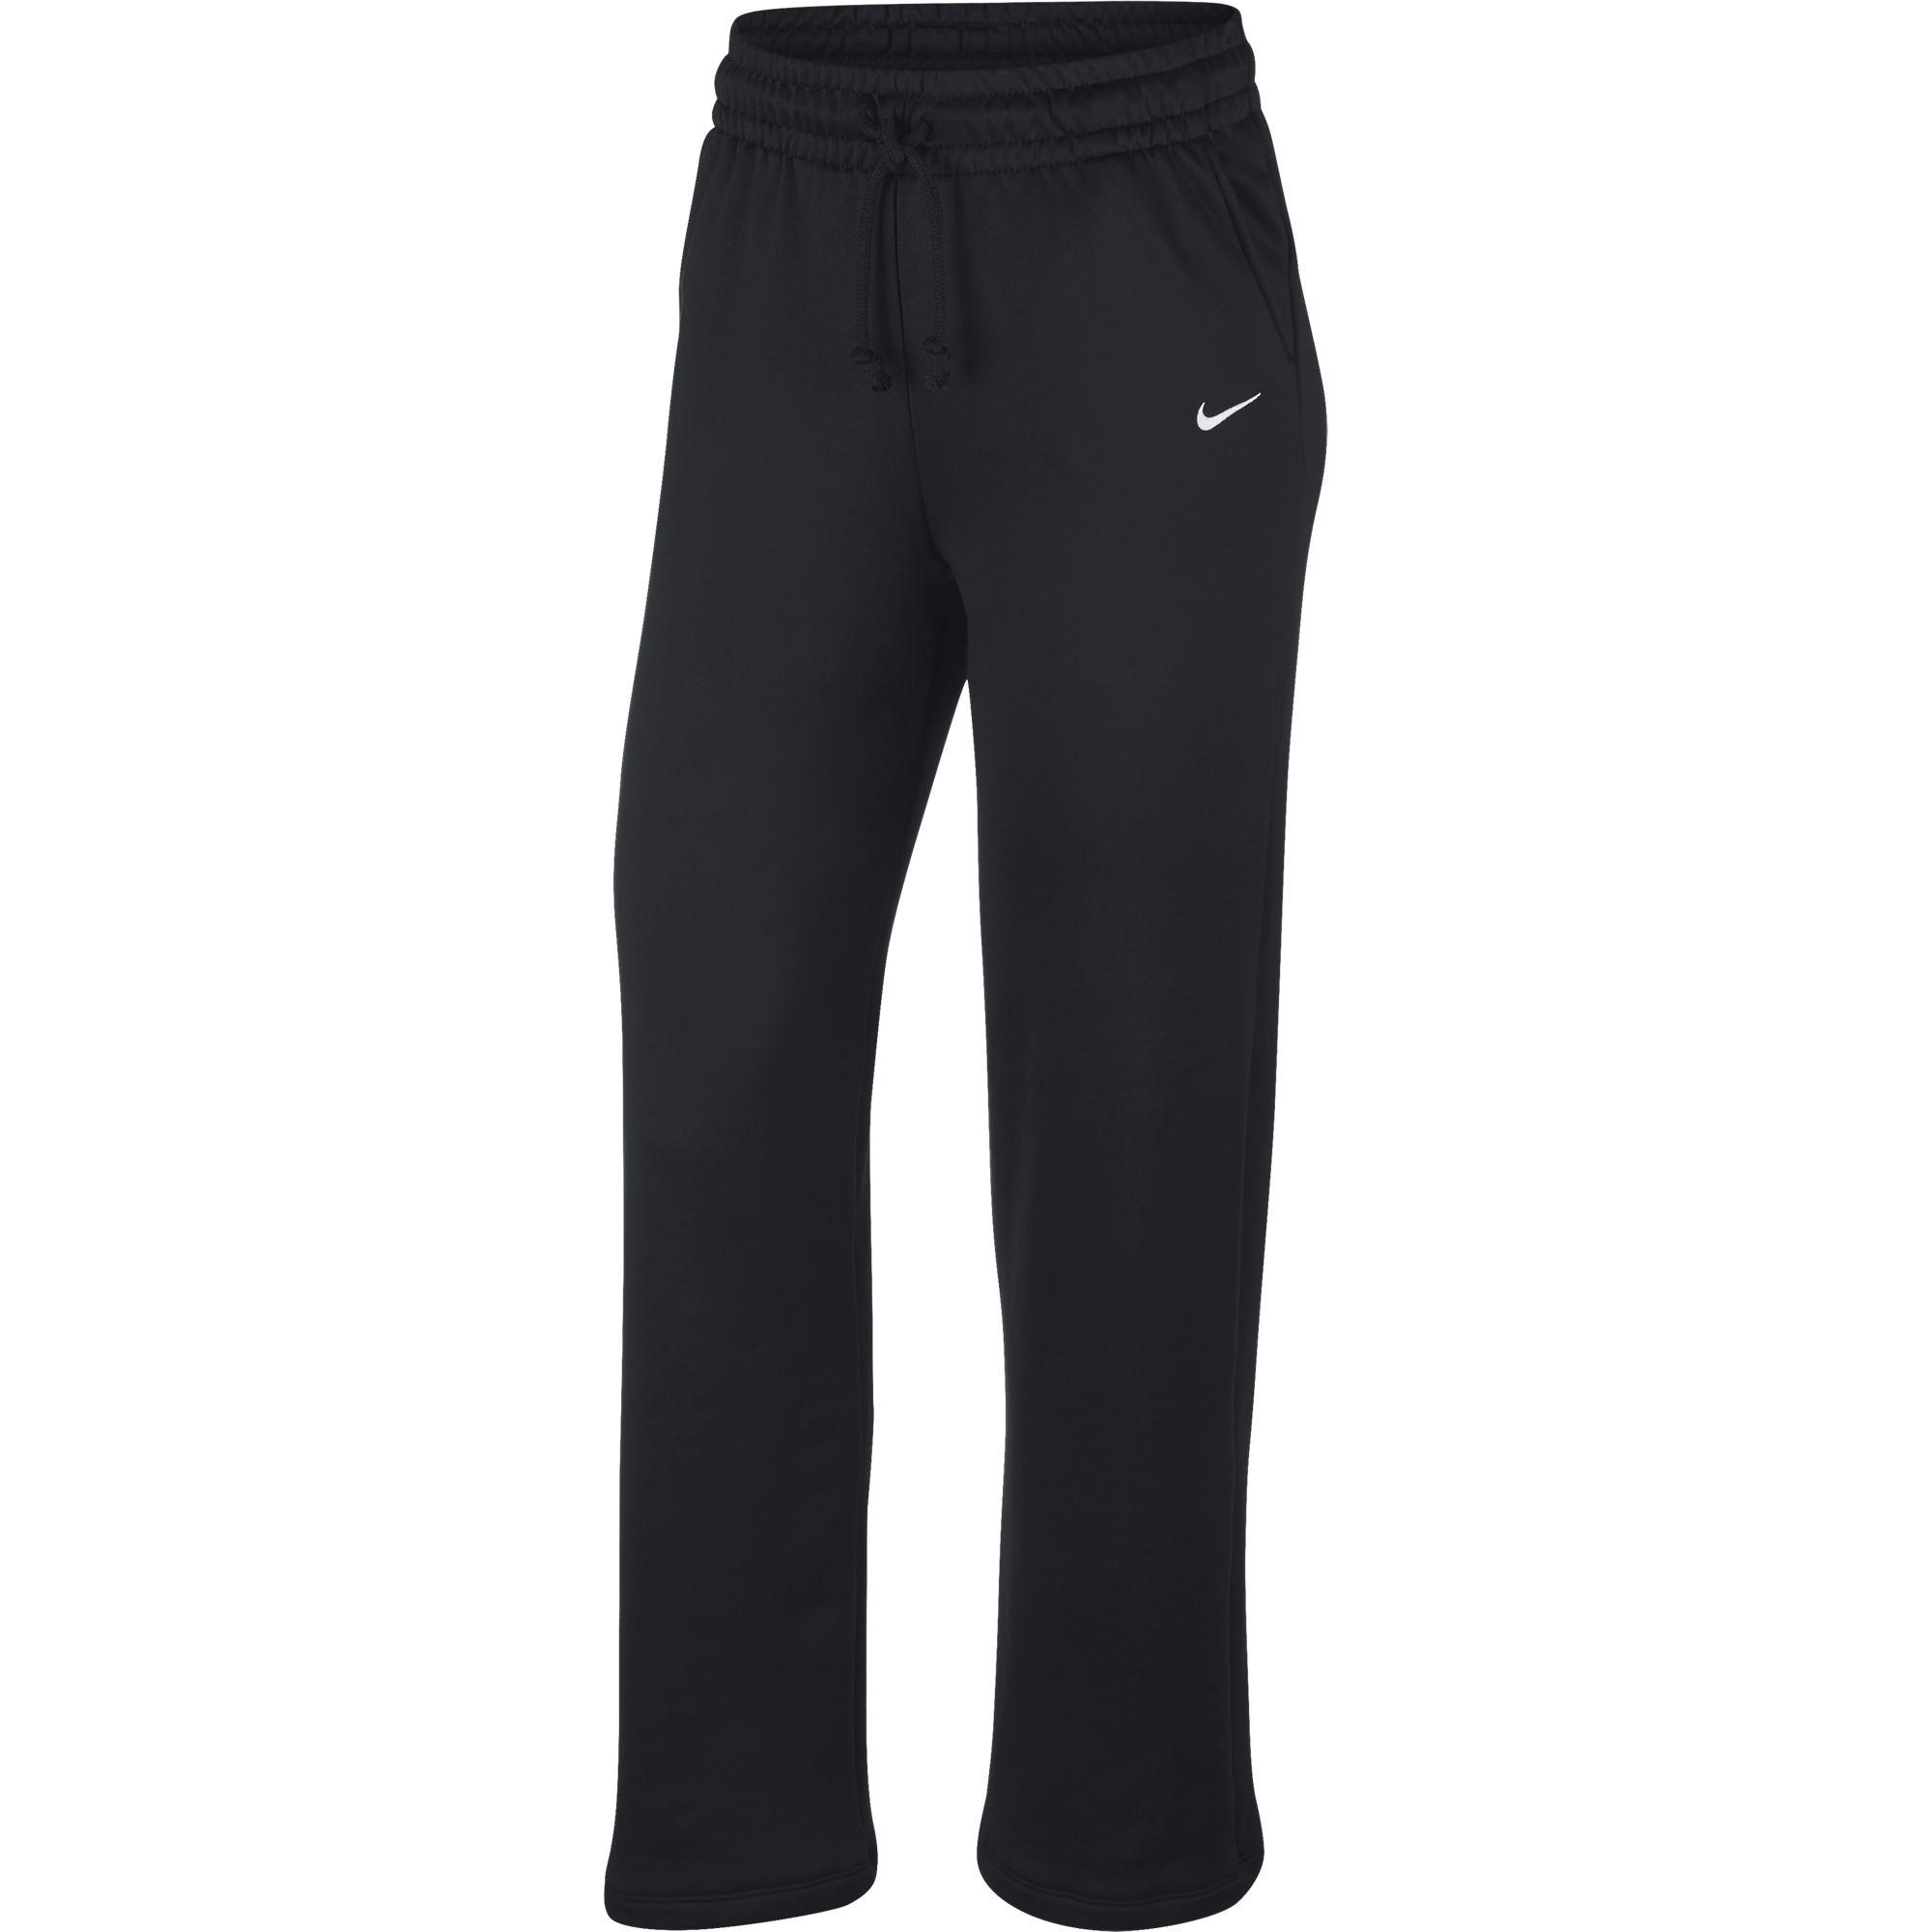 Women's Therma Graphic Training Sweatpants, Black, swatch